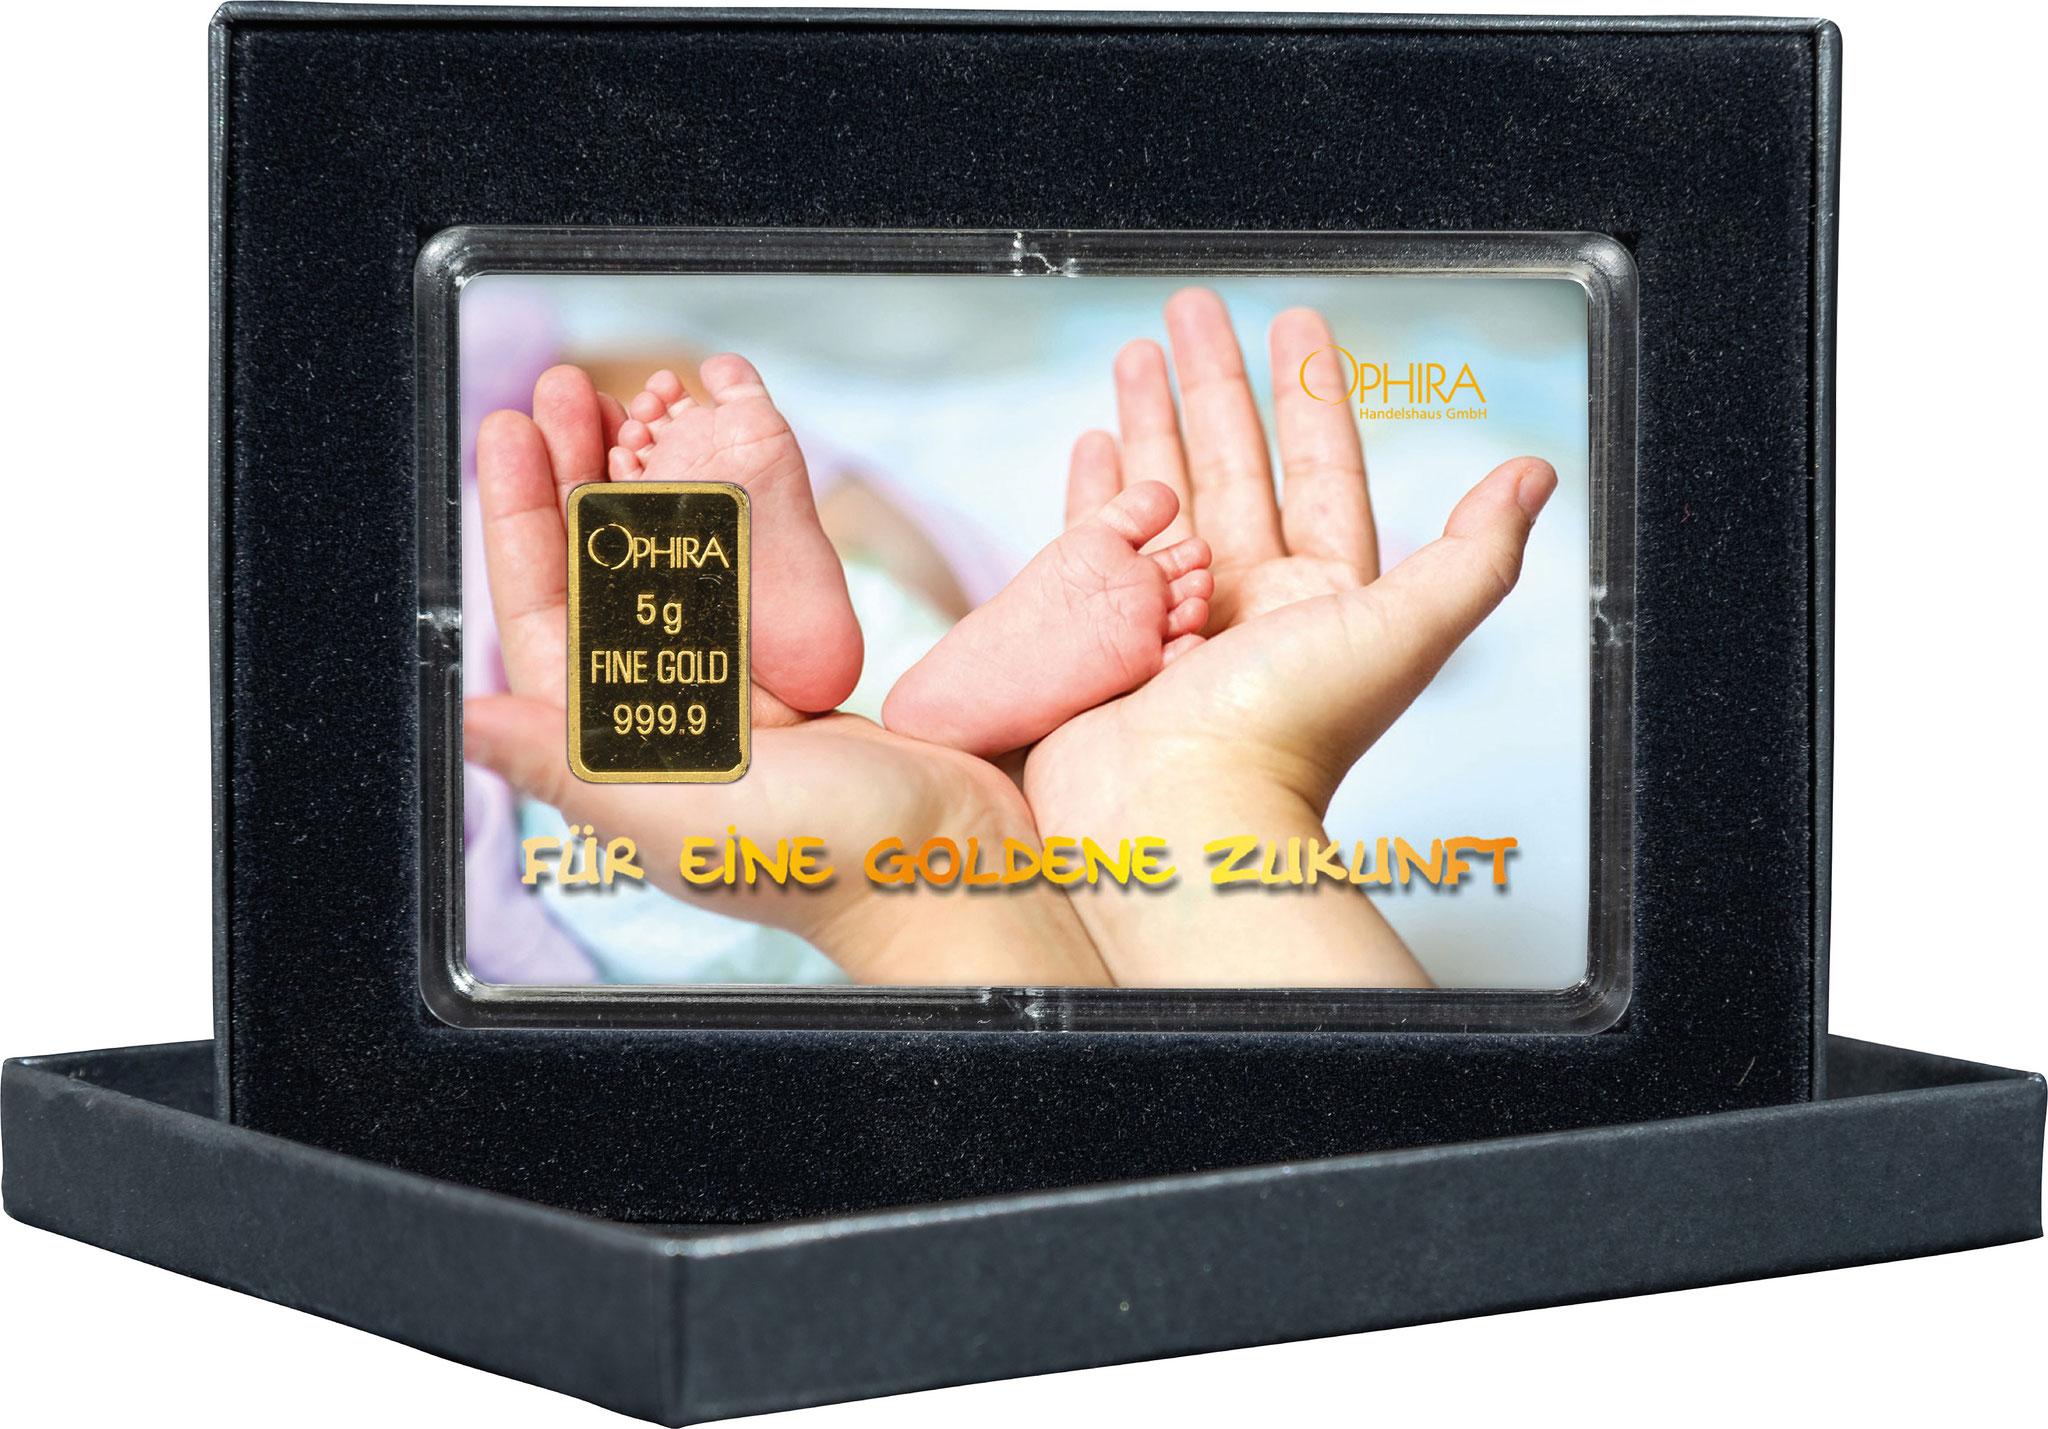 Geschenkbarren Geburt Taufe mit einem Goldbarren in edlem Etui